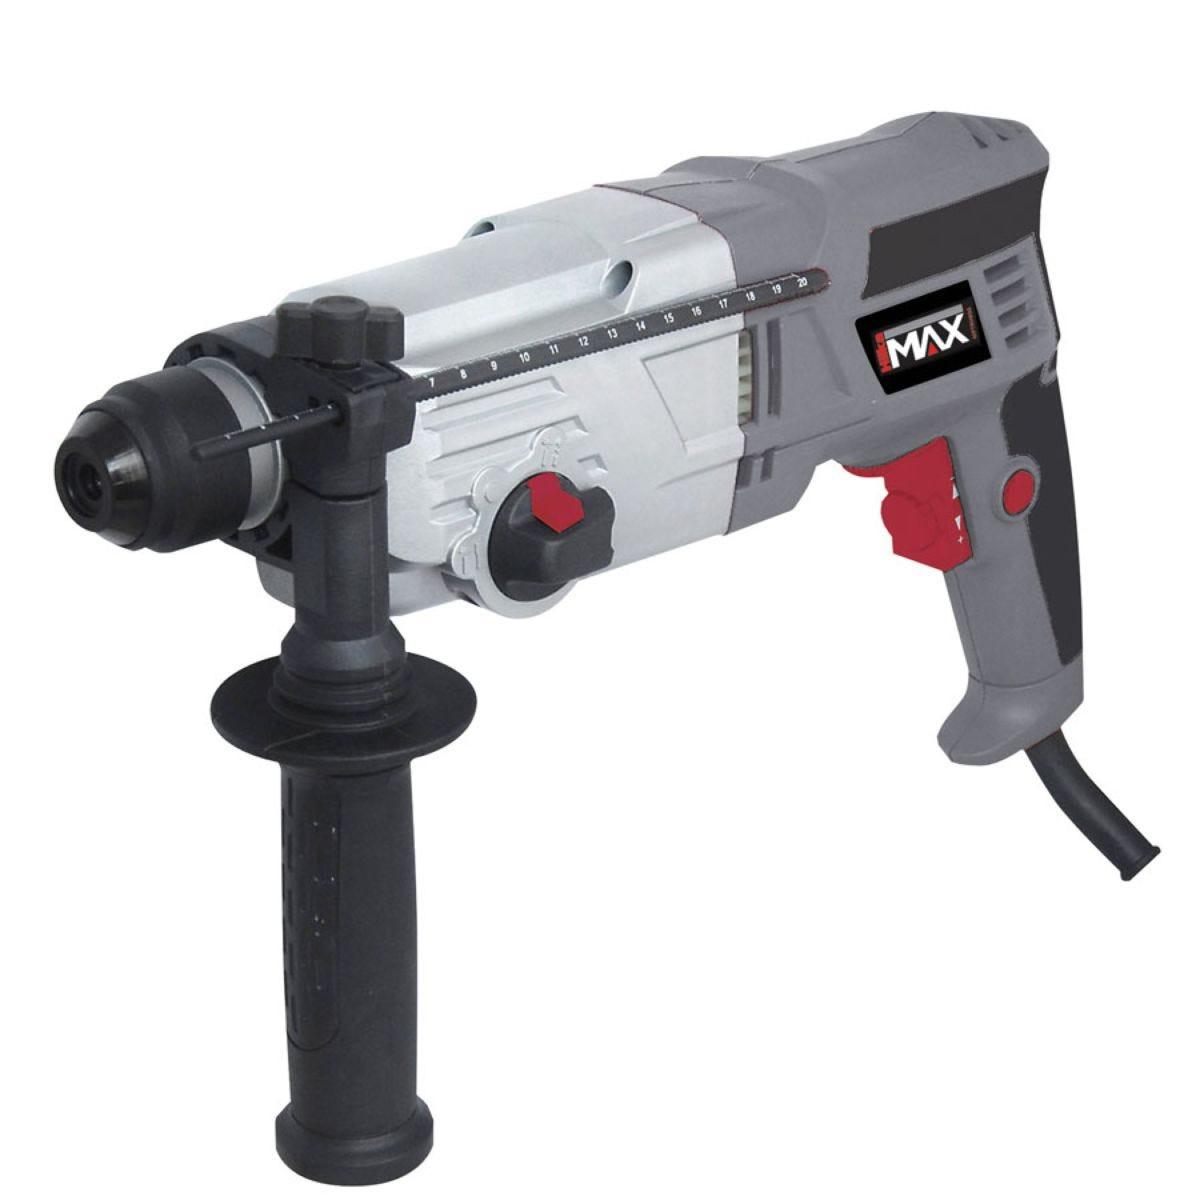 Hilka 850W Rotary Hammer Drill